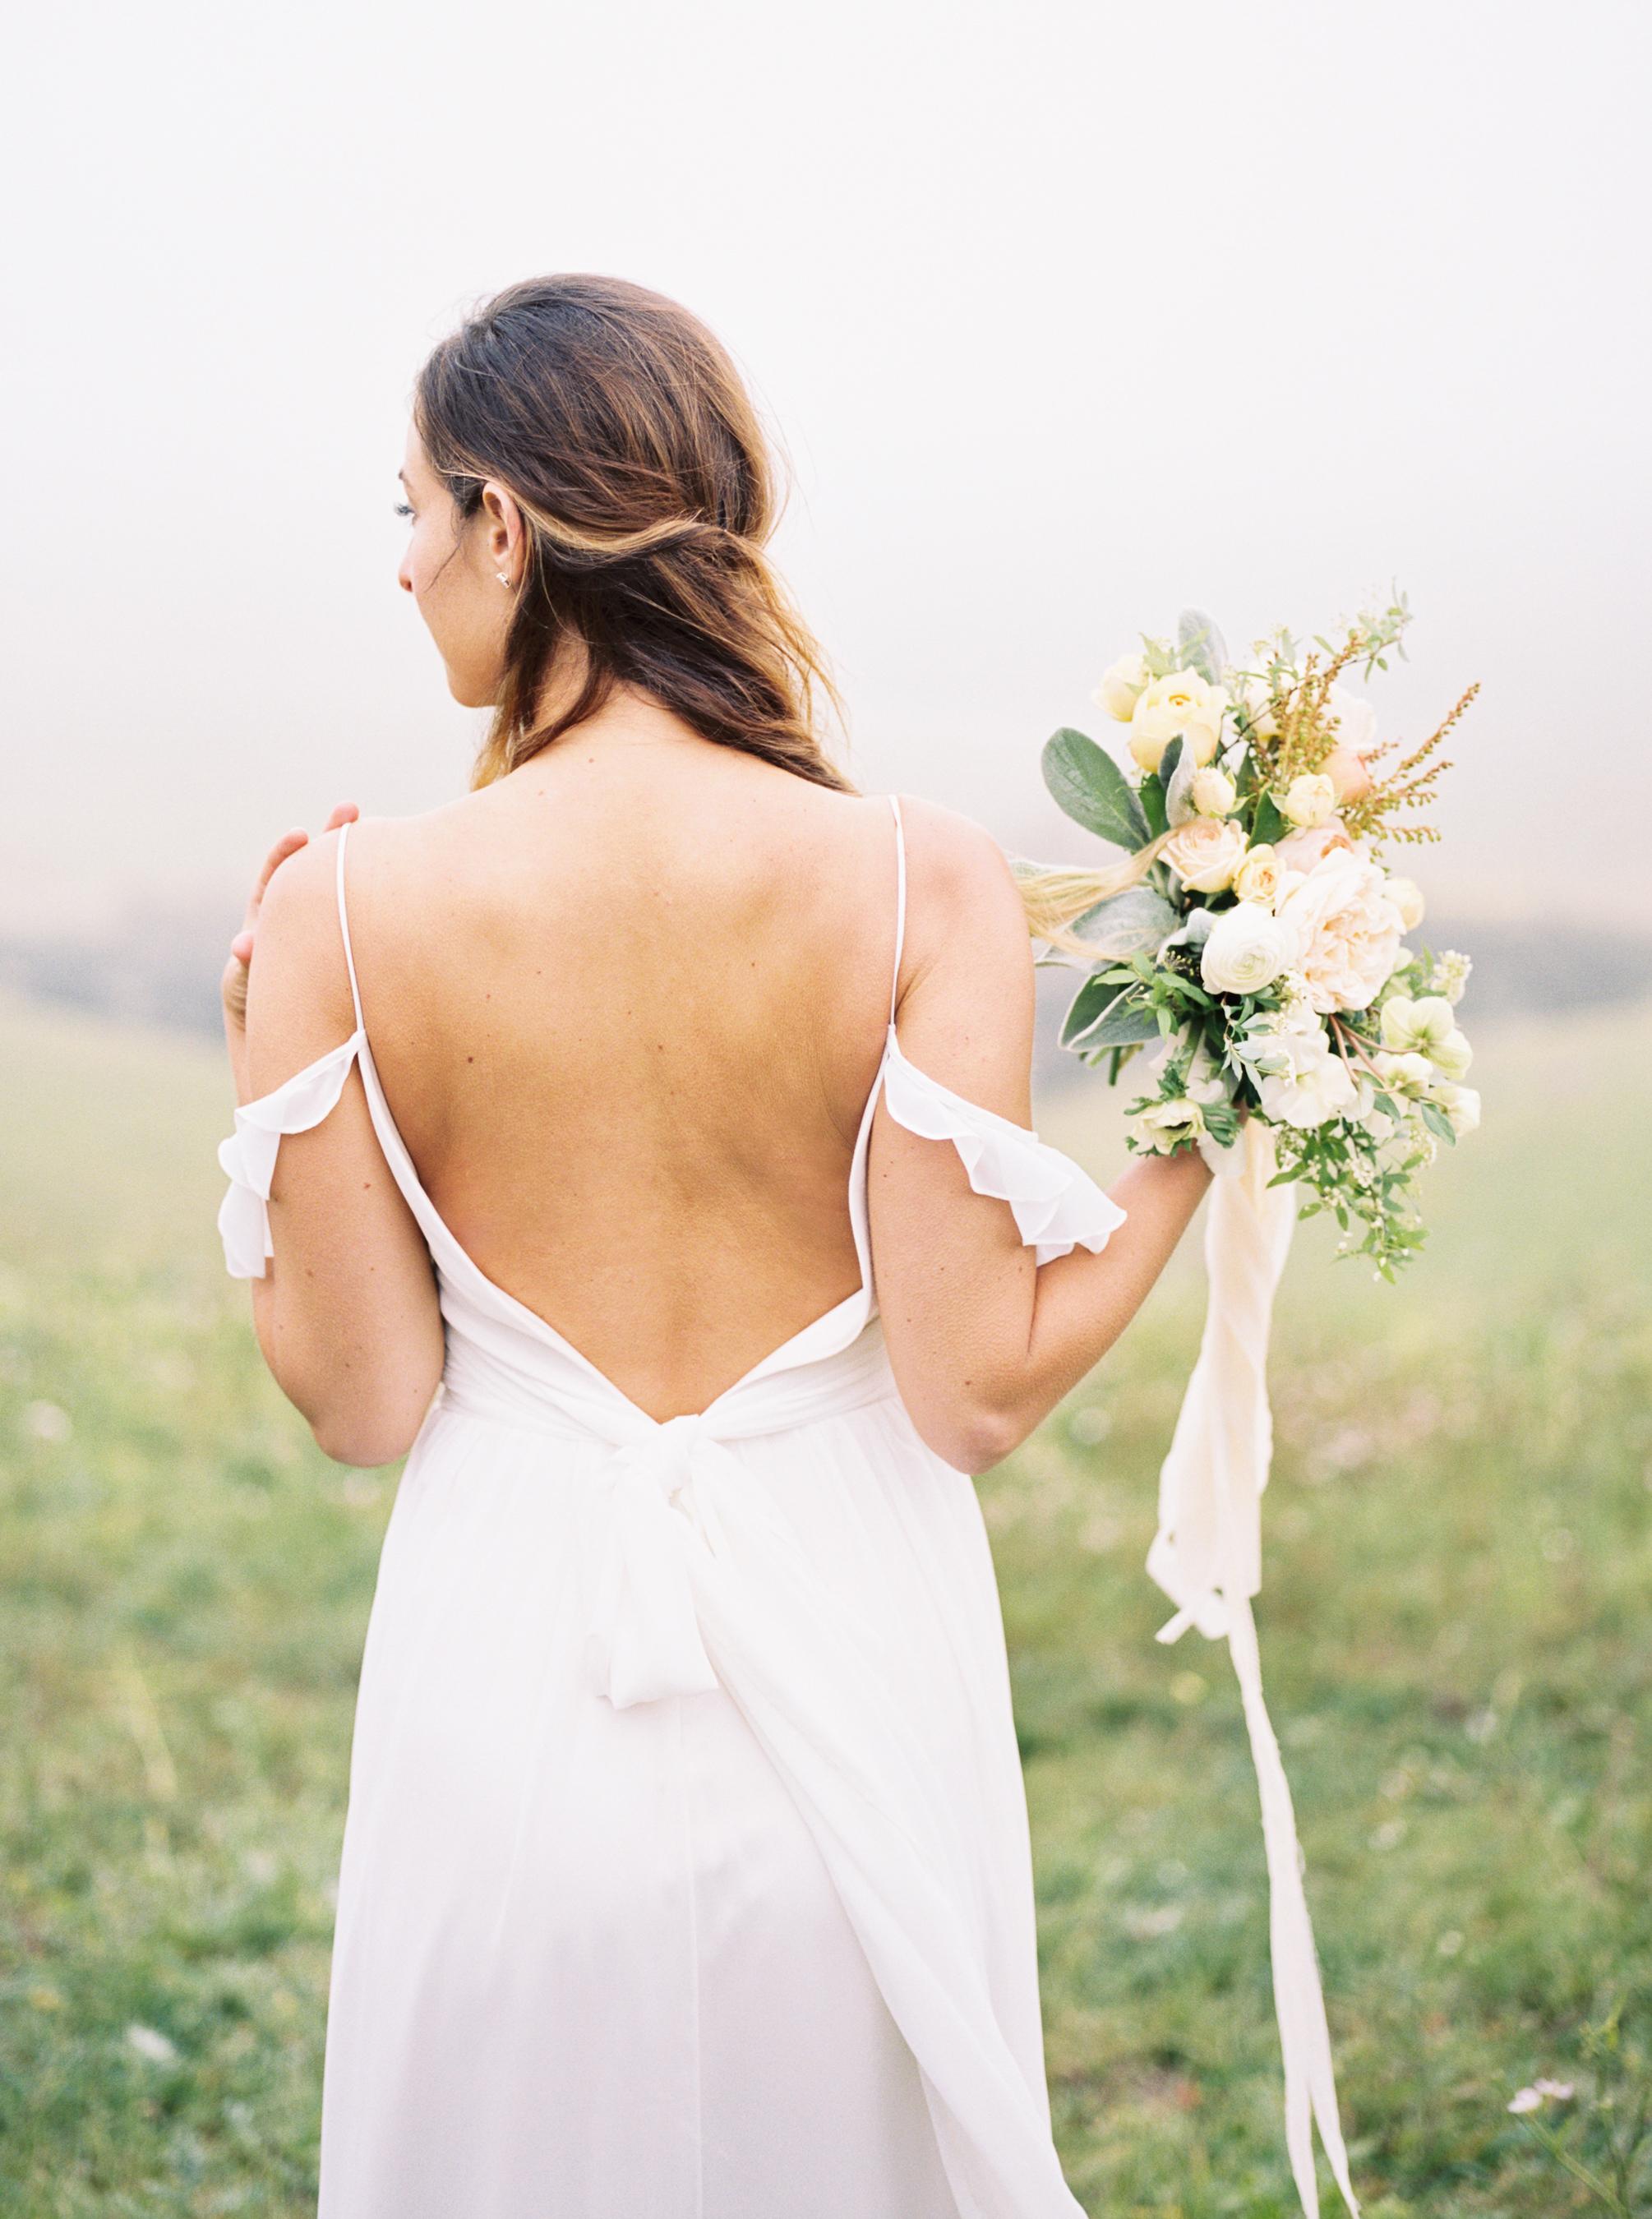 Danford-Photography-Bozeman-Montana-California-Wedding-Engagement-Photographer-33.jpg